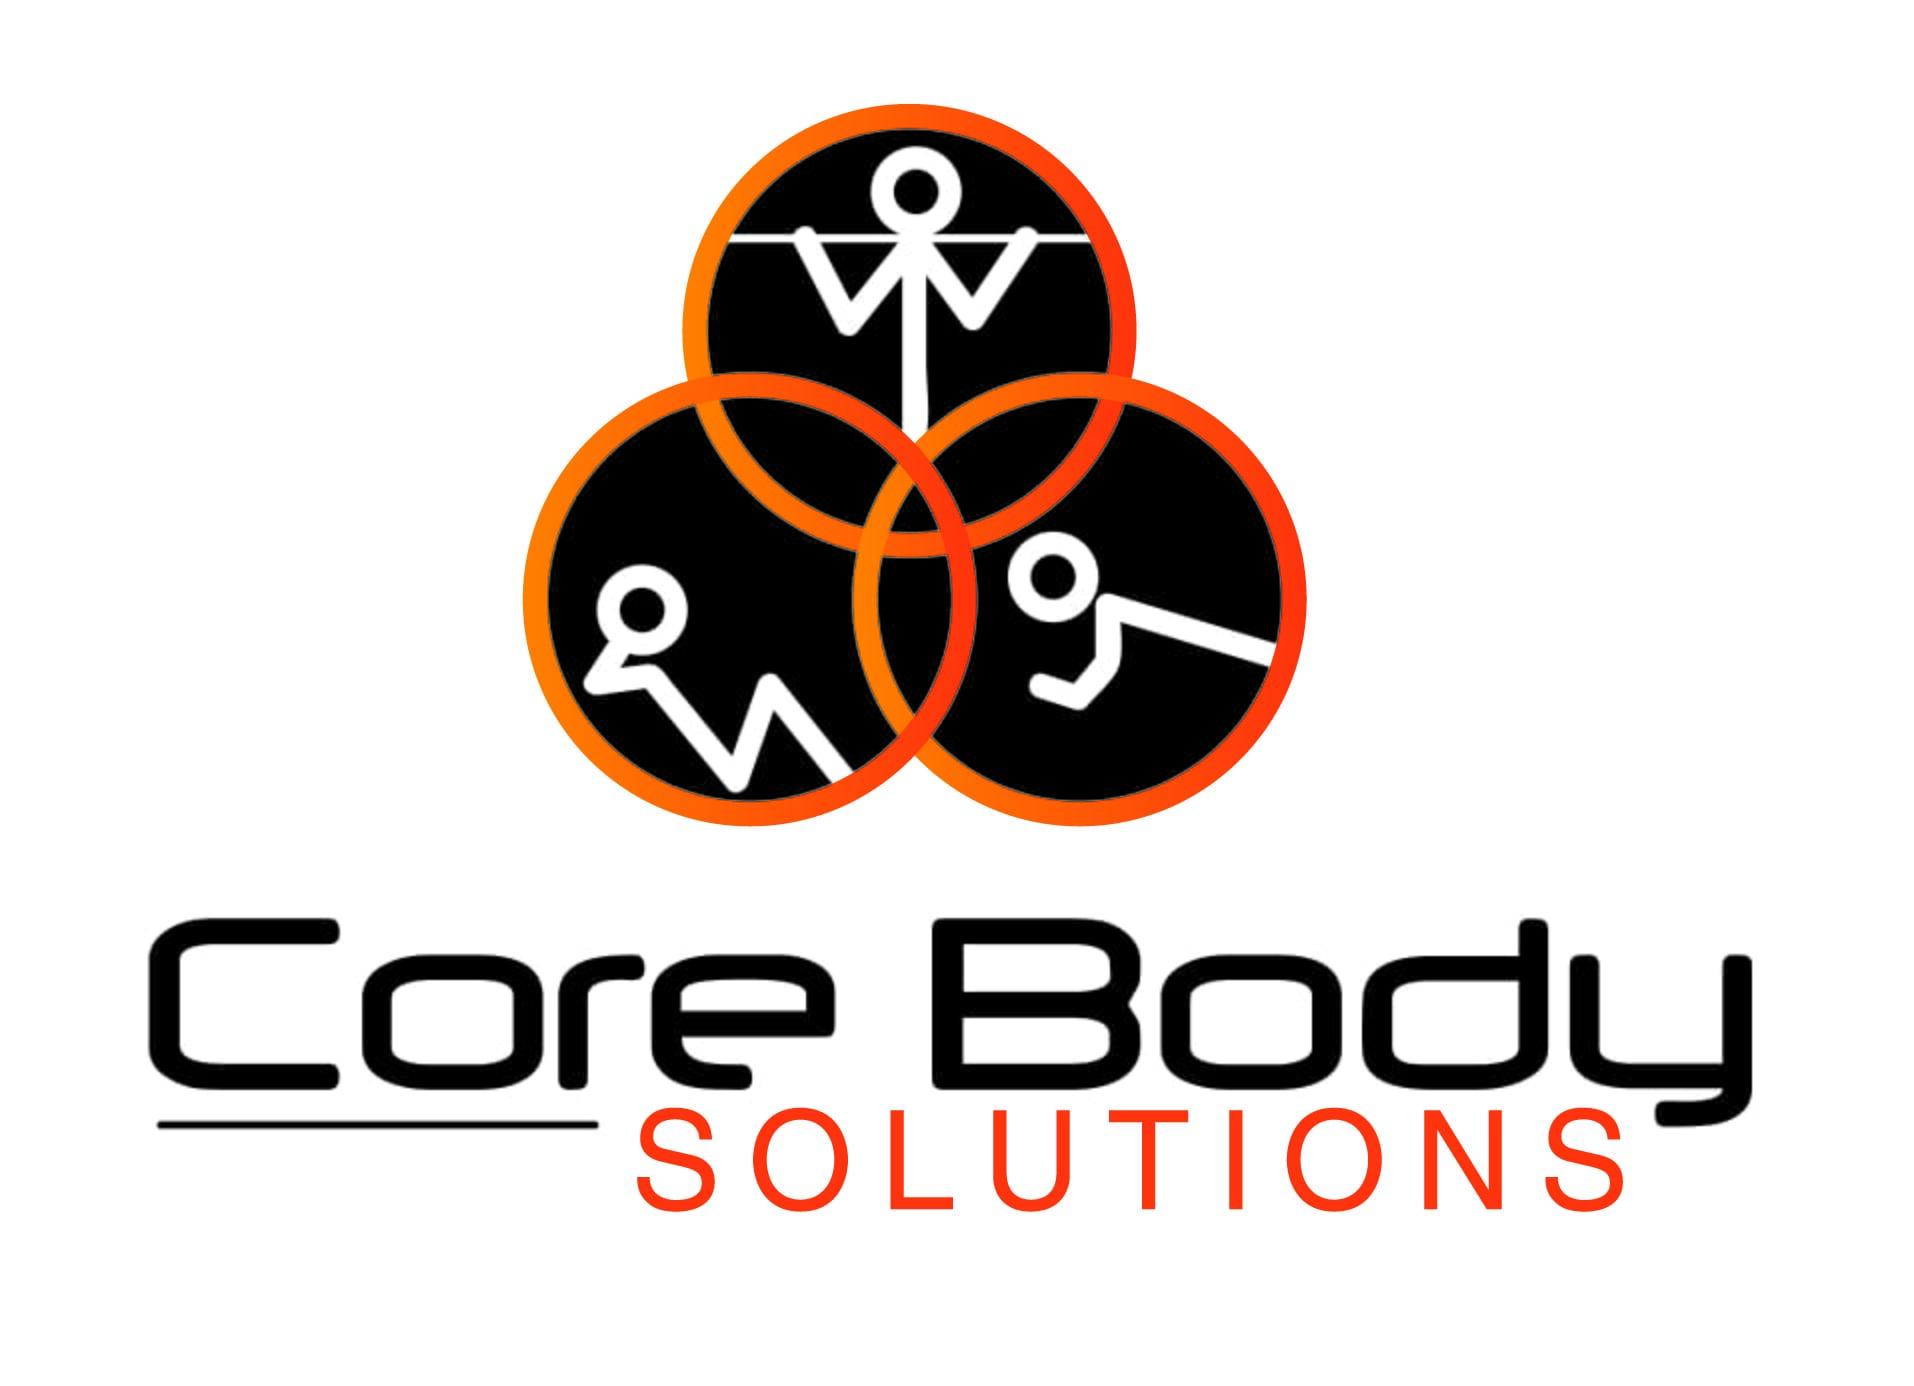 CBS_Orange logo